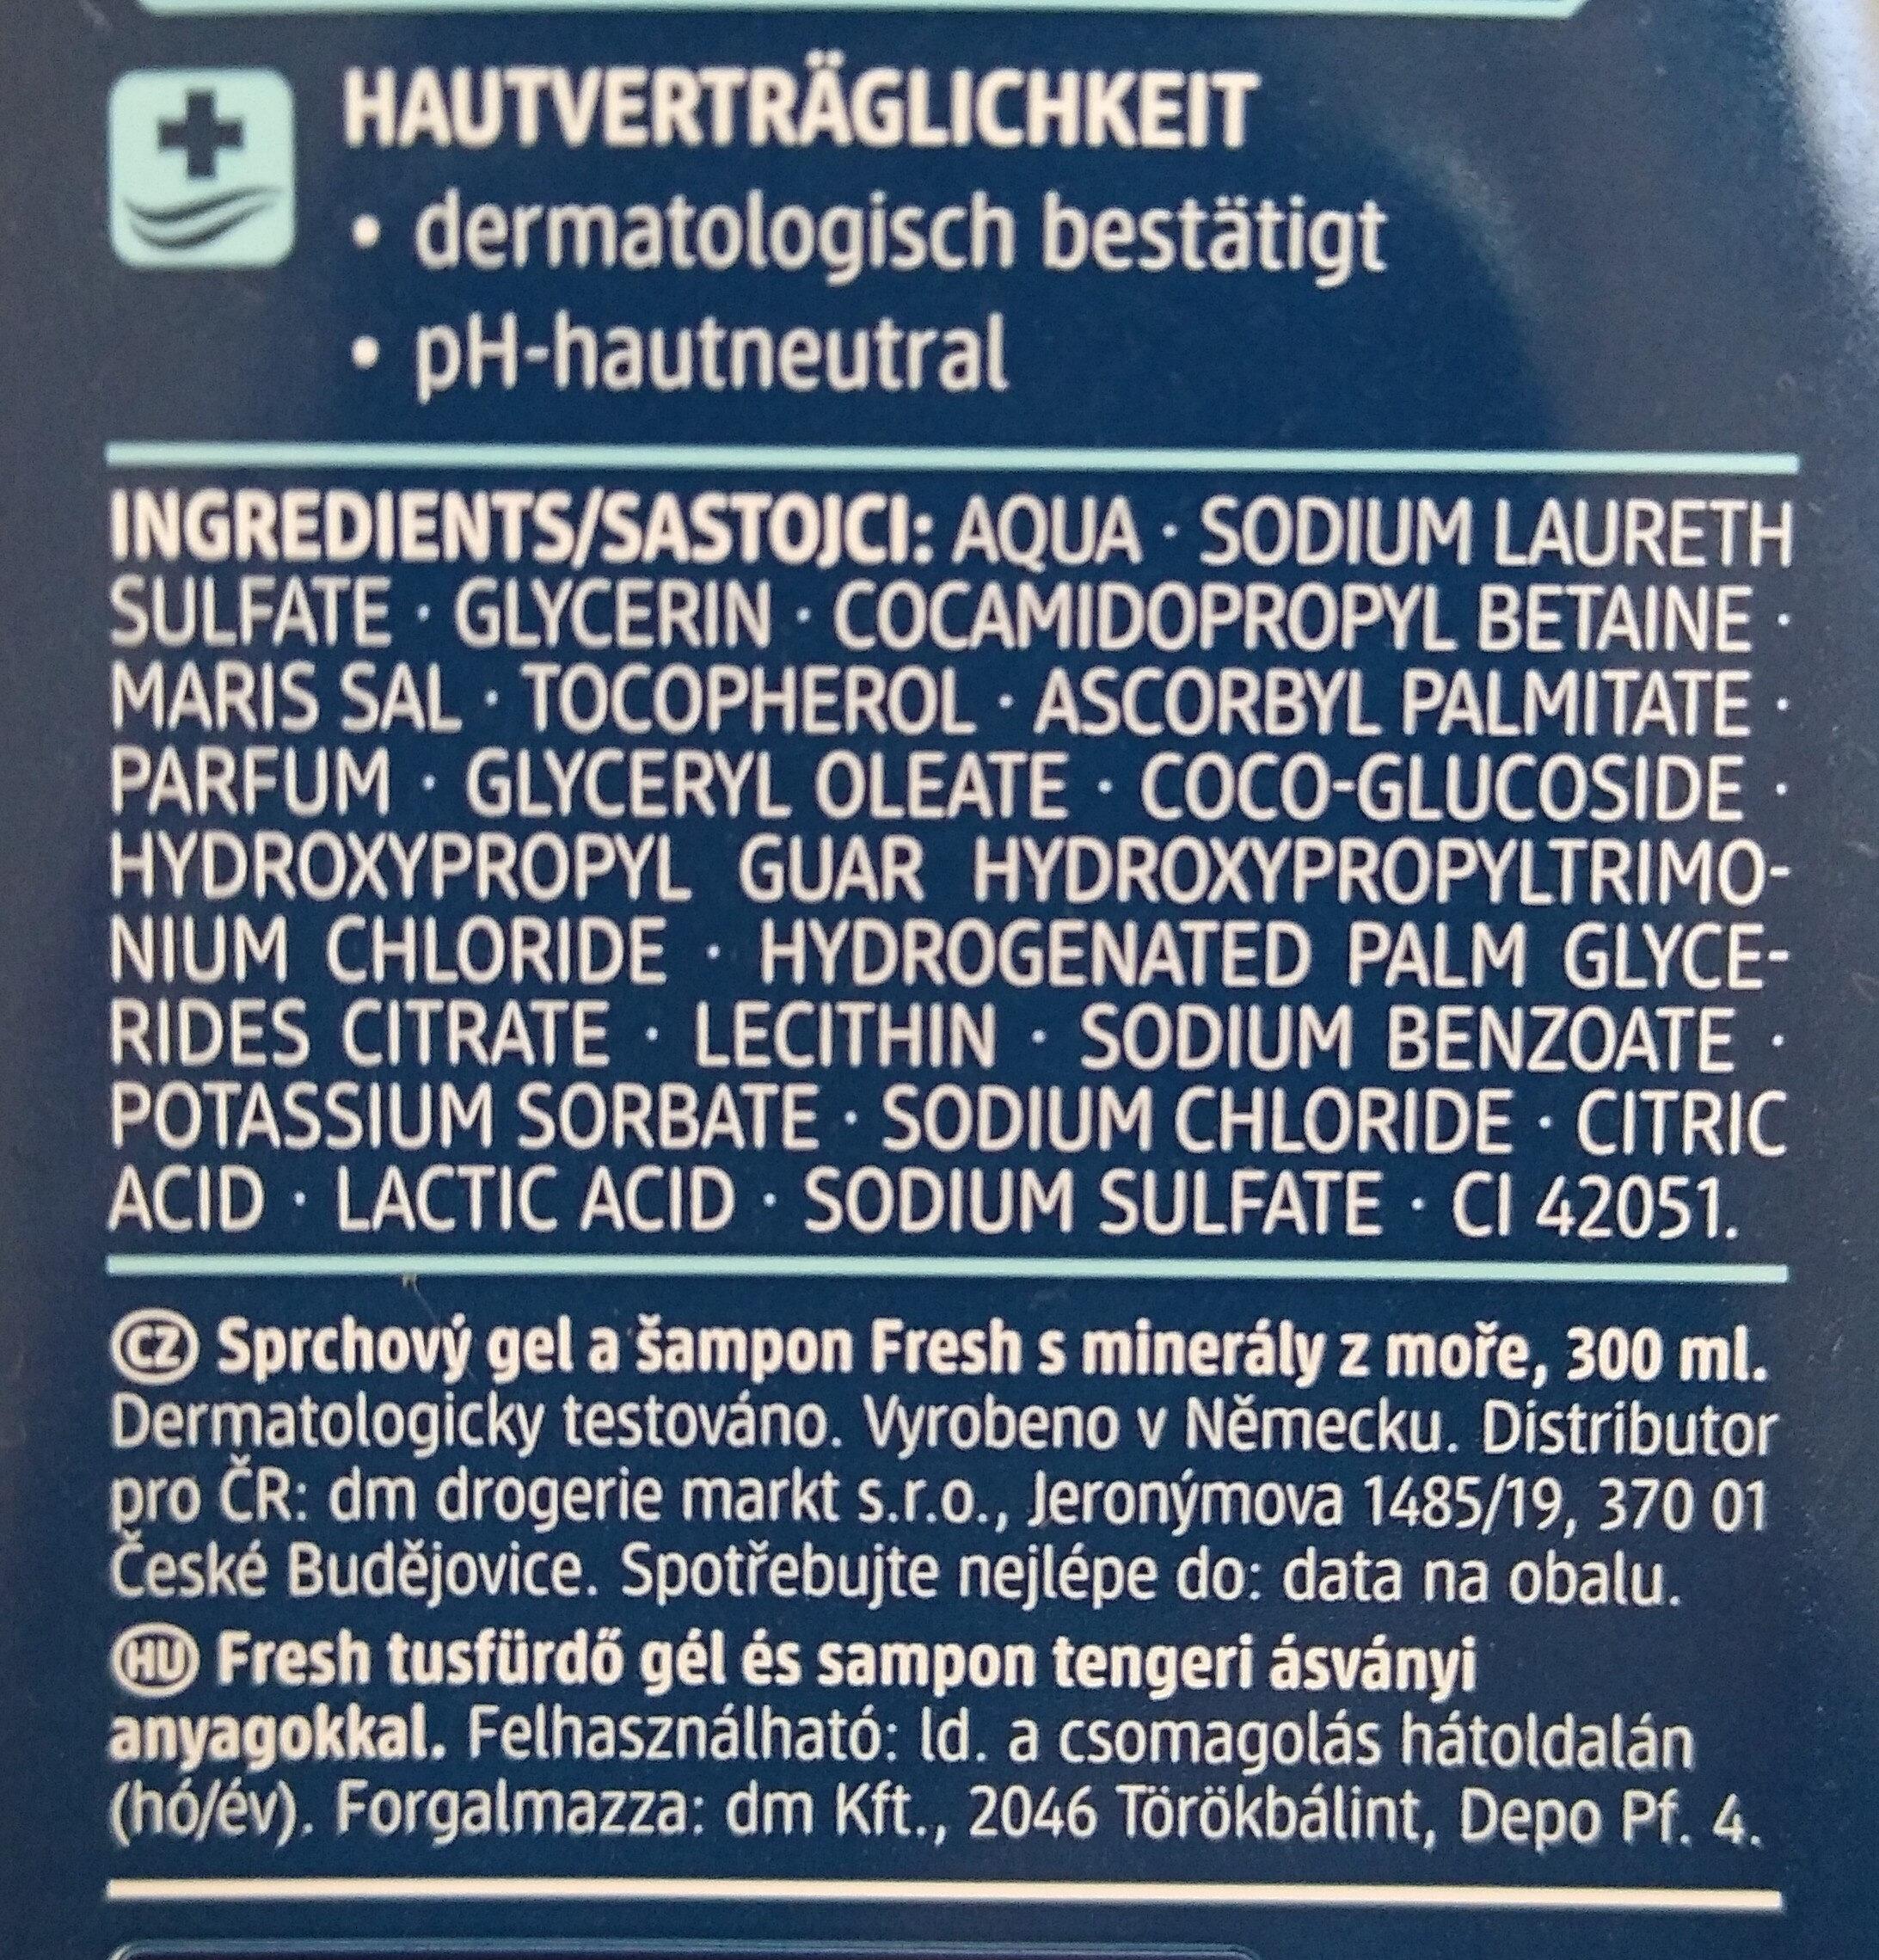 fresh Duschgel - Ingredients